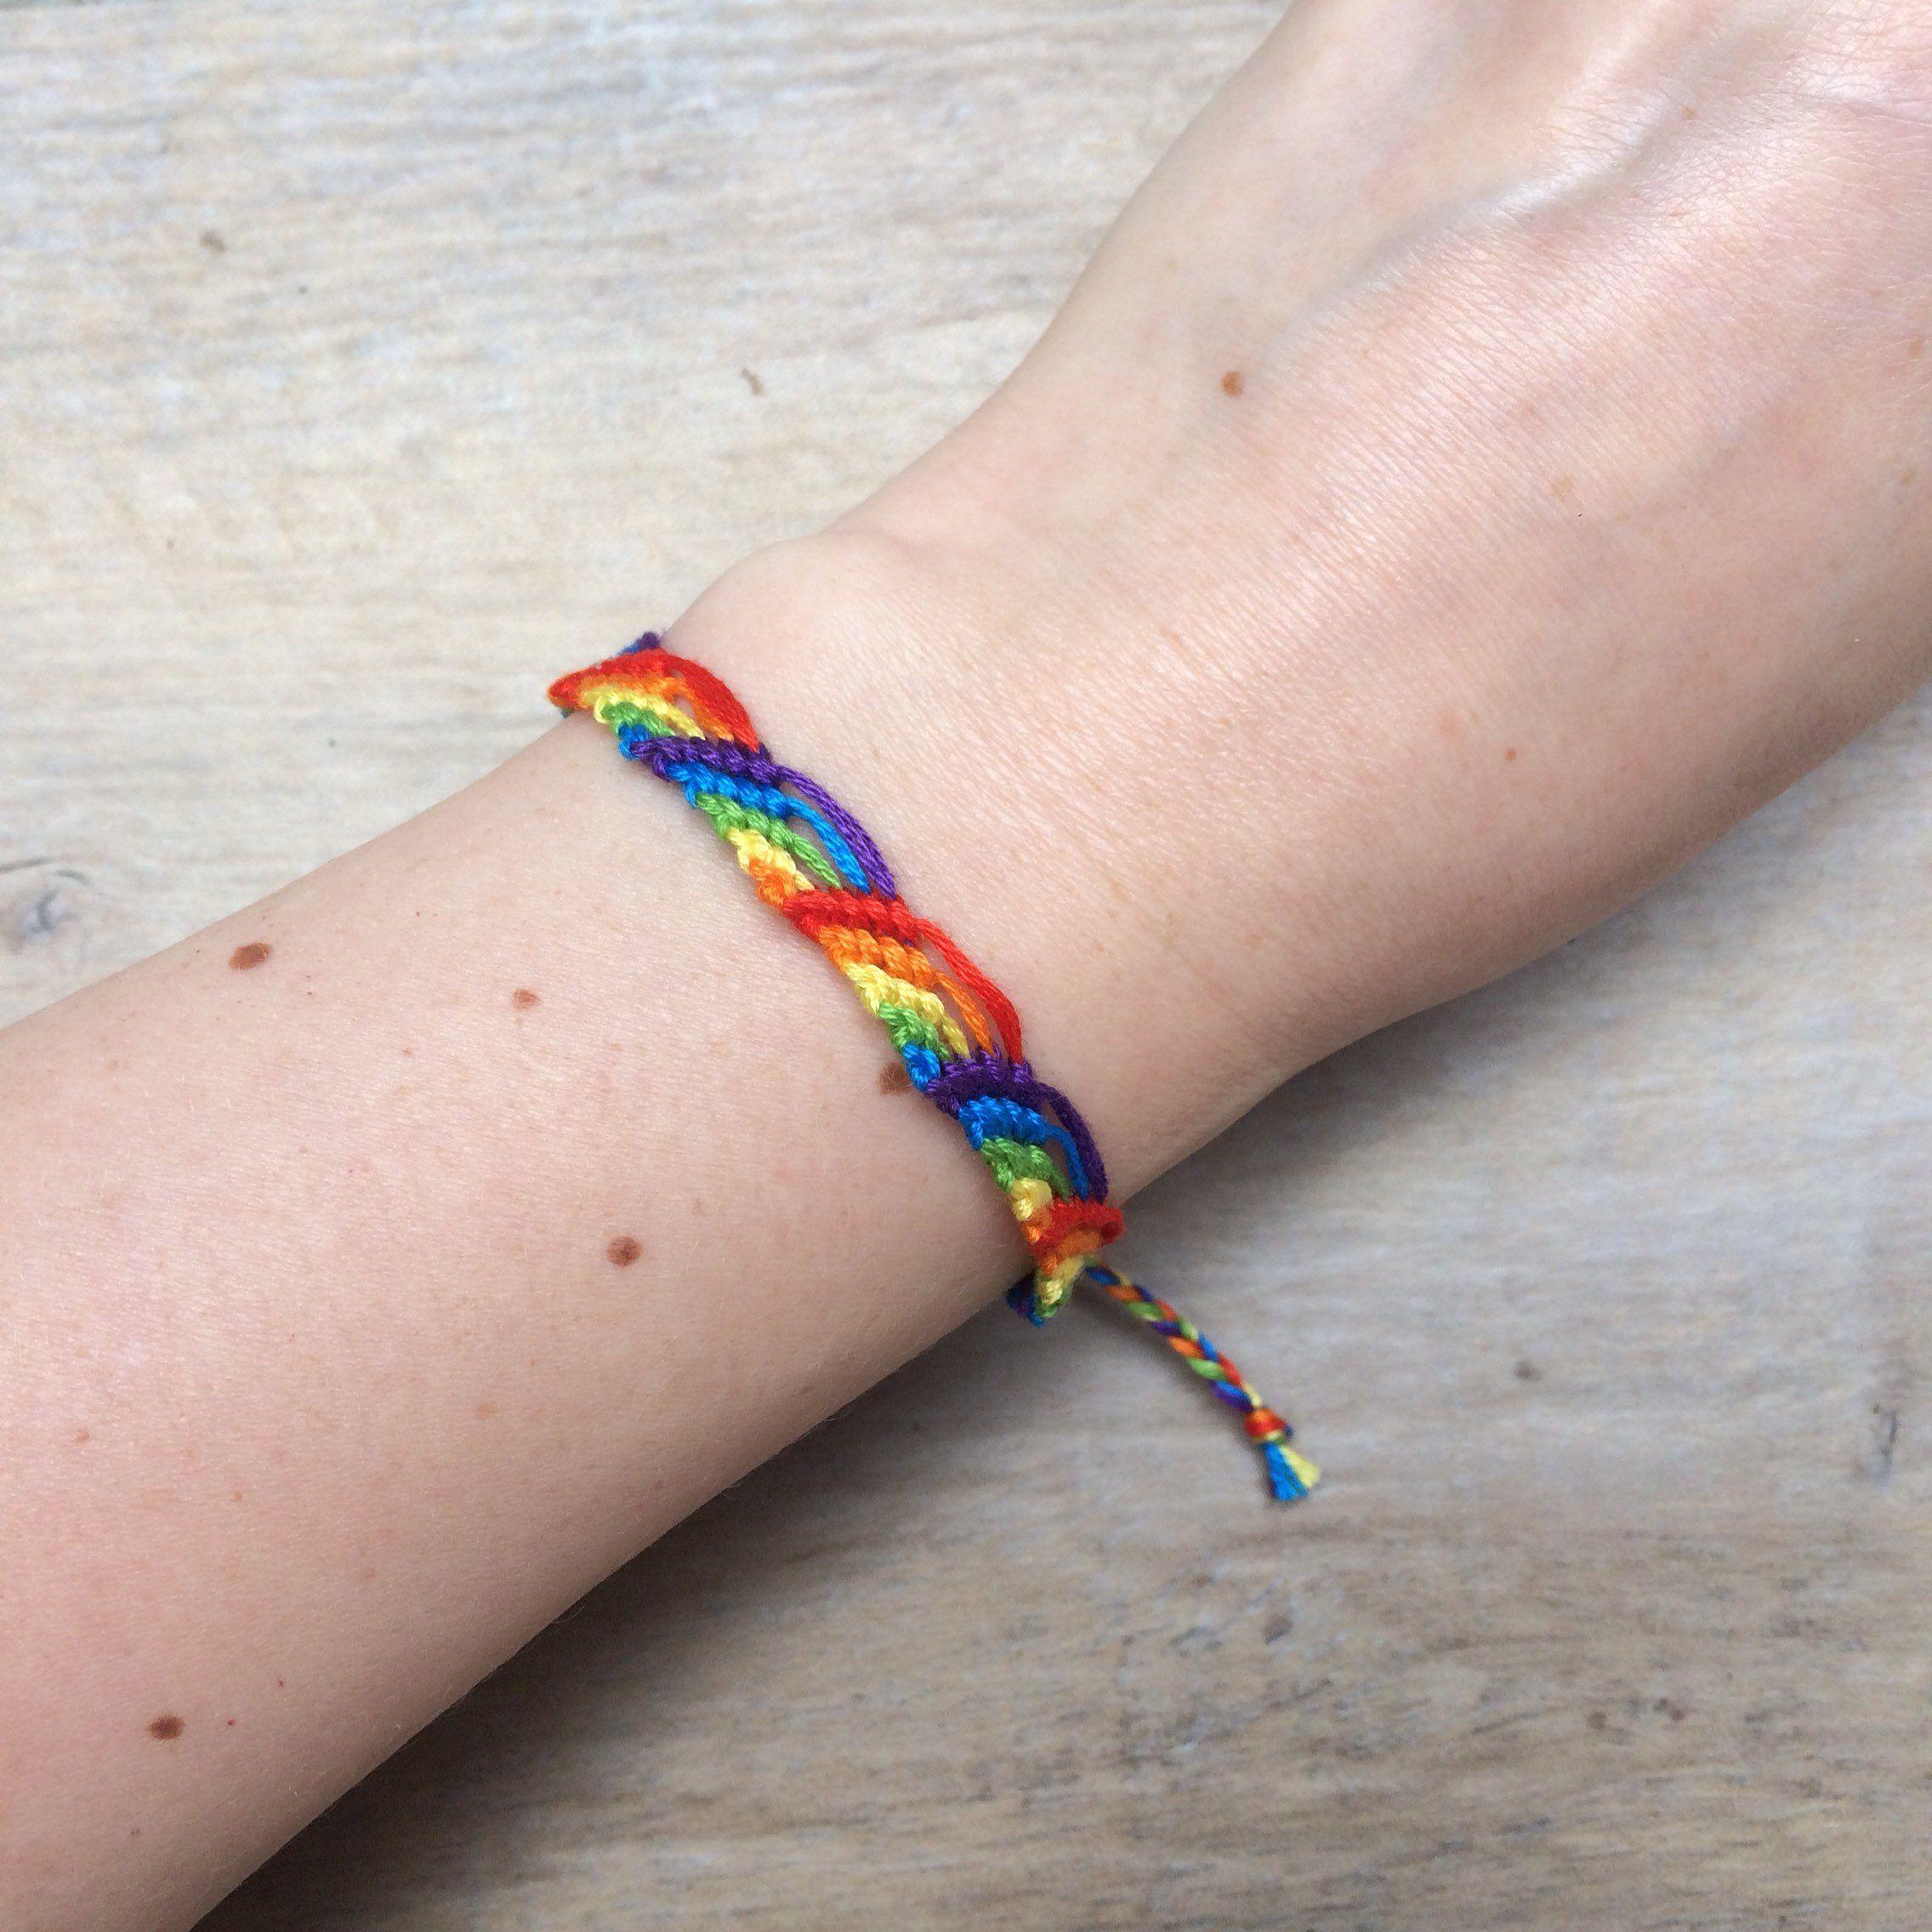 64eacb53f654a LGBT pride bracelet jewelry. Gay pansexual asexual bi trans lesbian ...